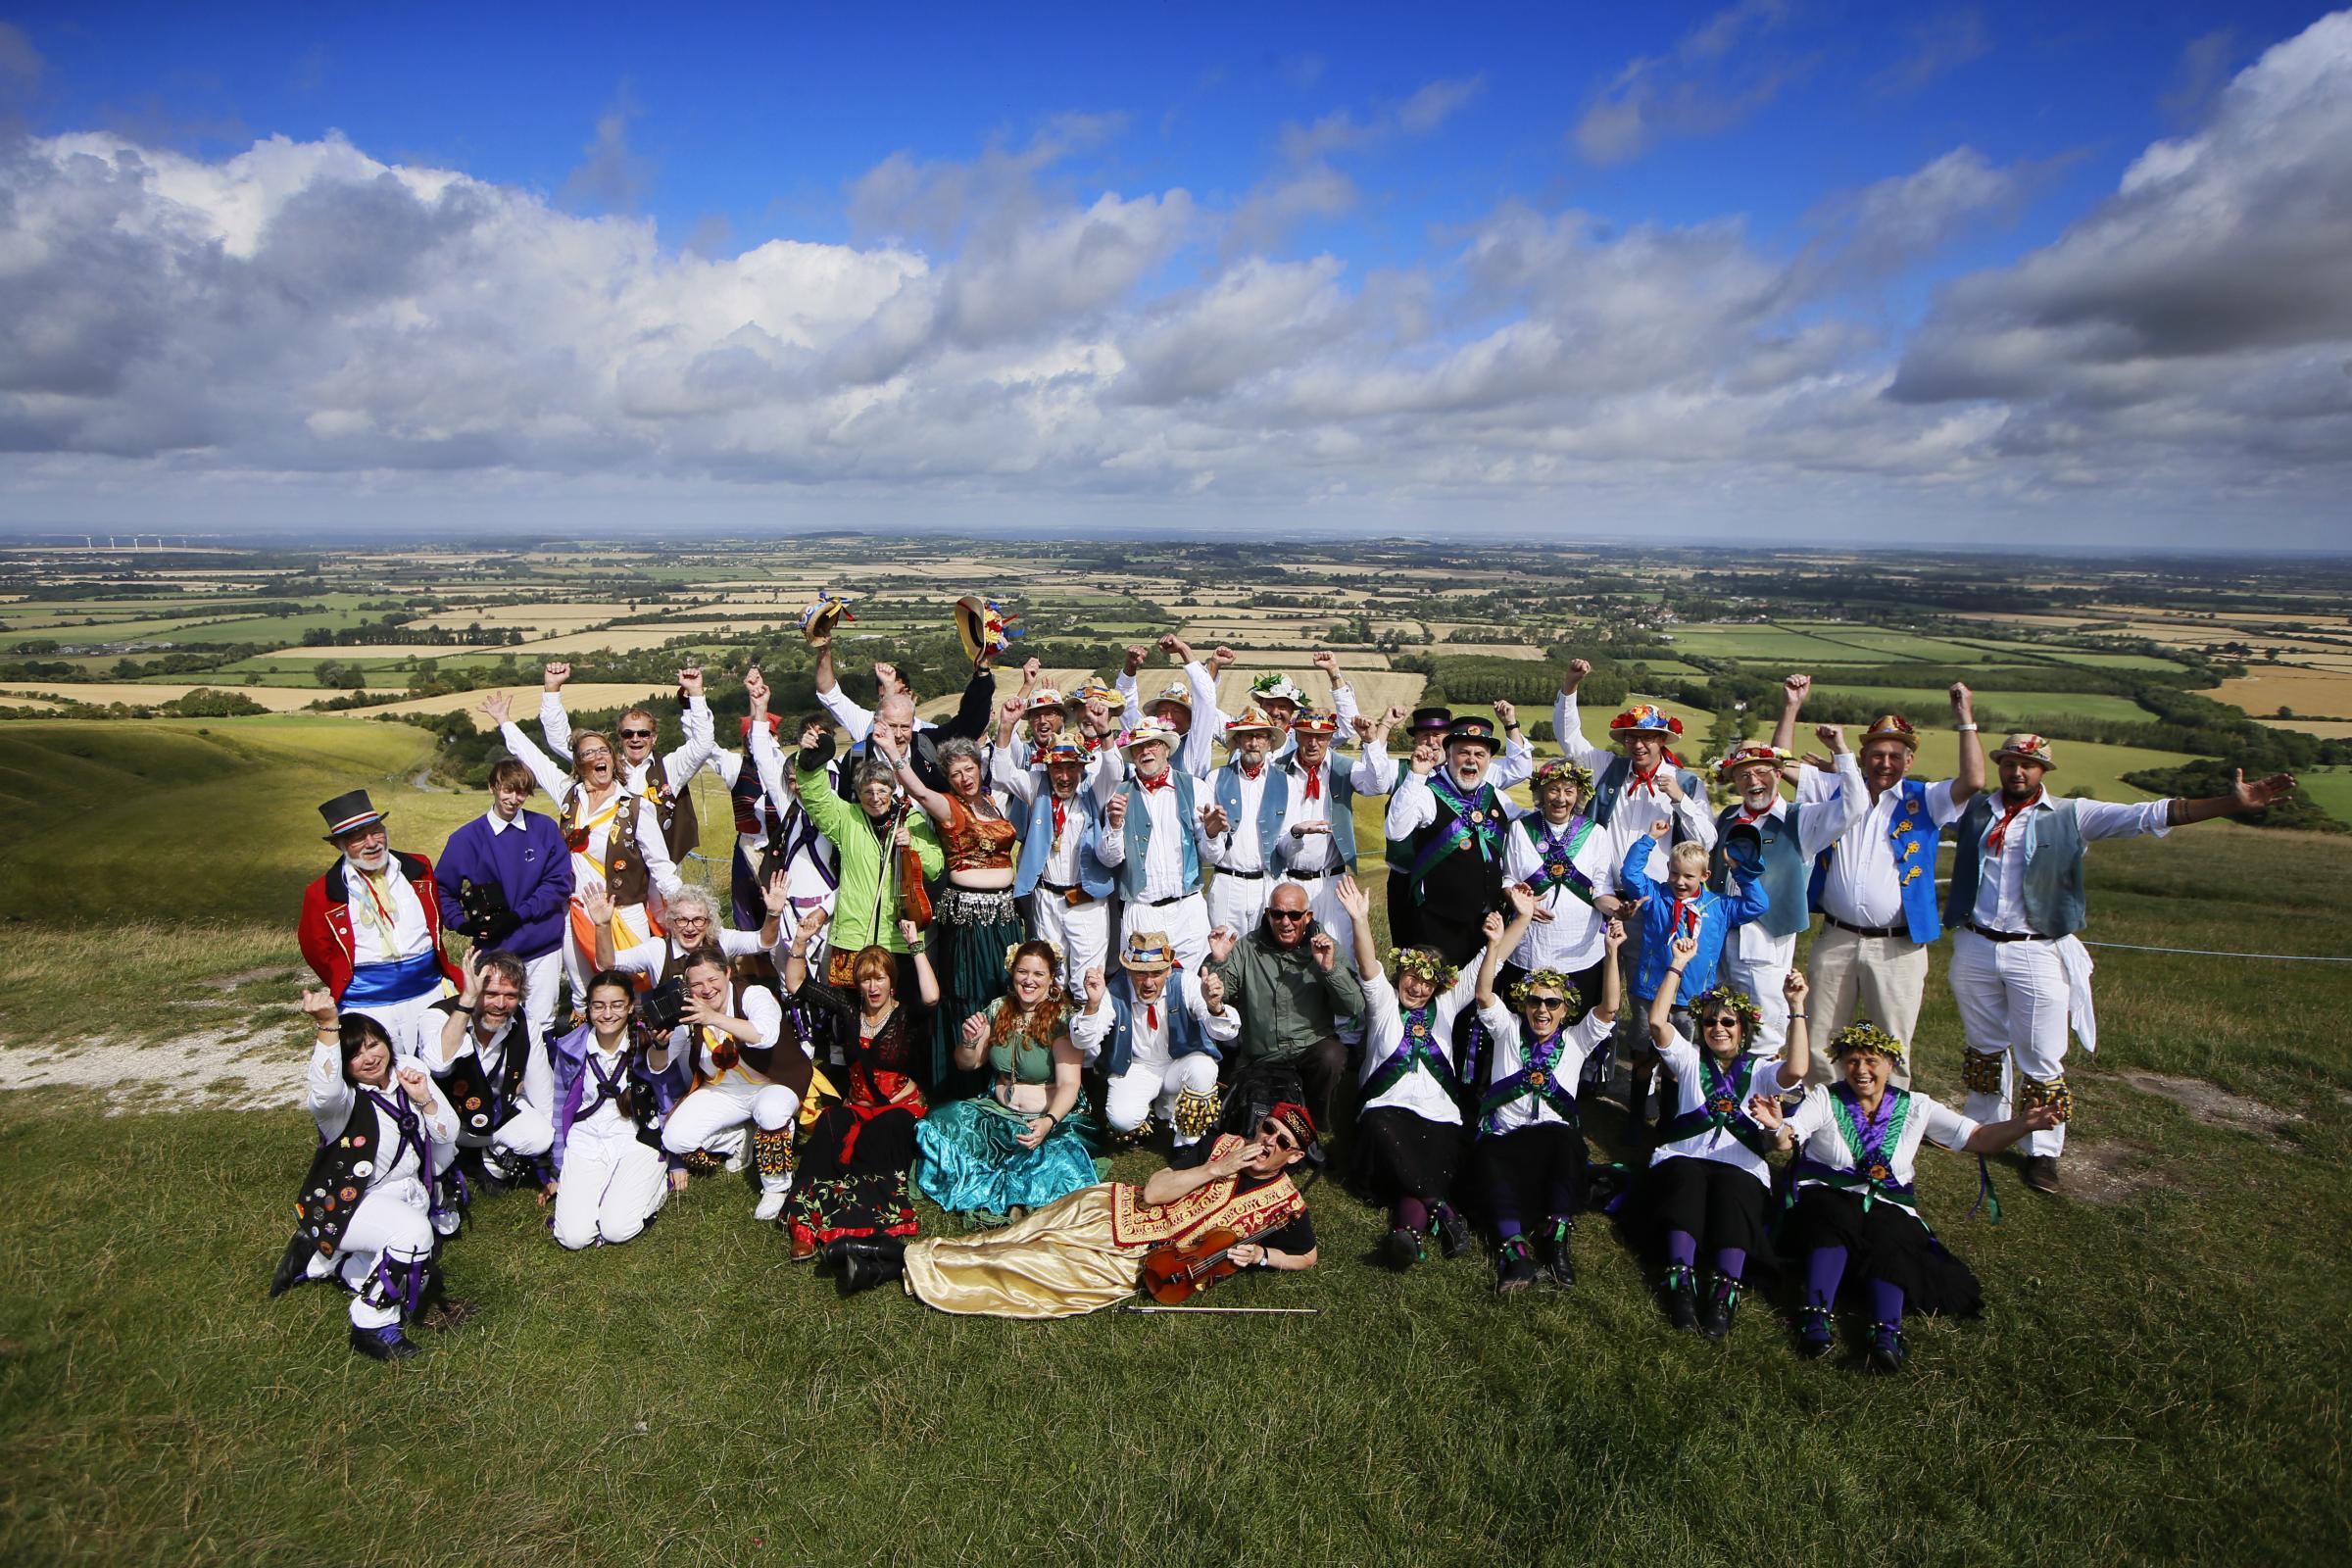 White Horse Hill Folk Festival 2019: Icknield Way Morris Men 60th anniversary